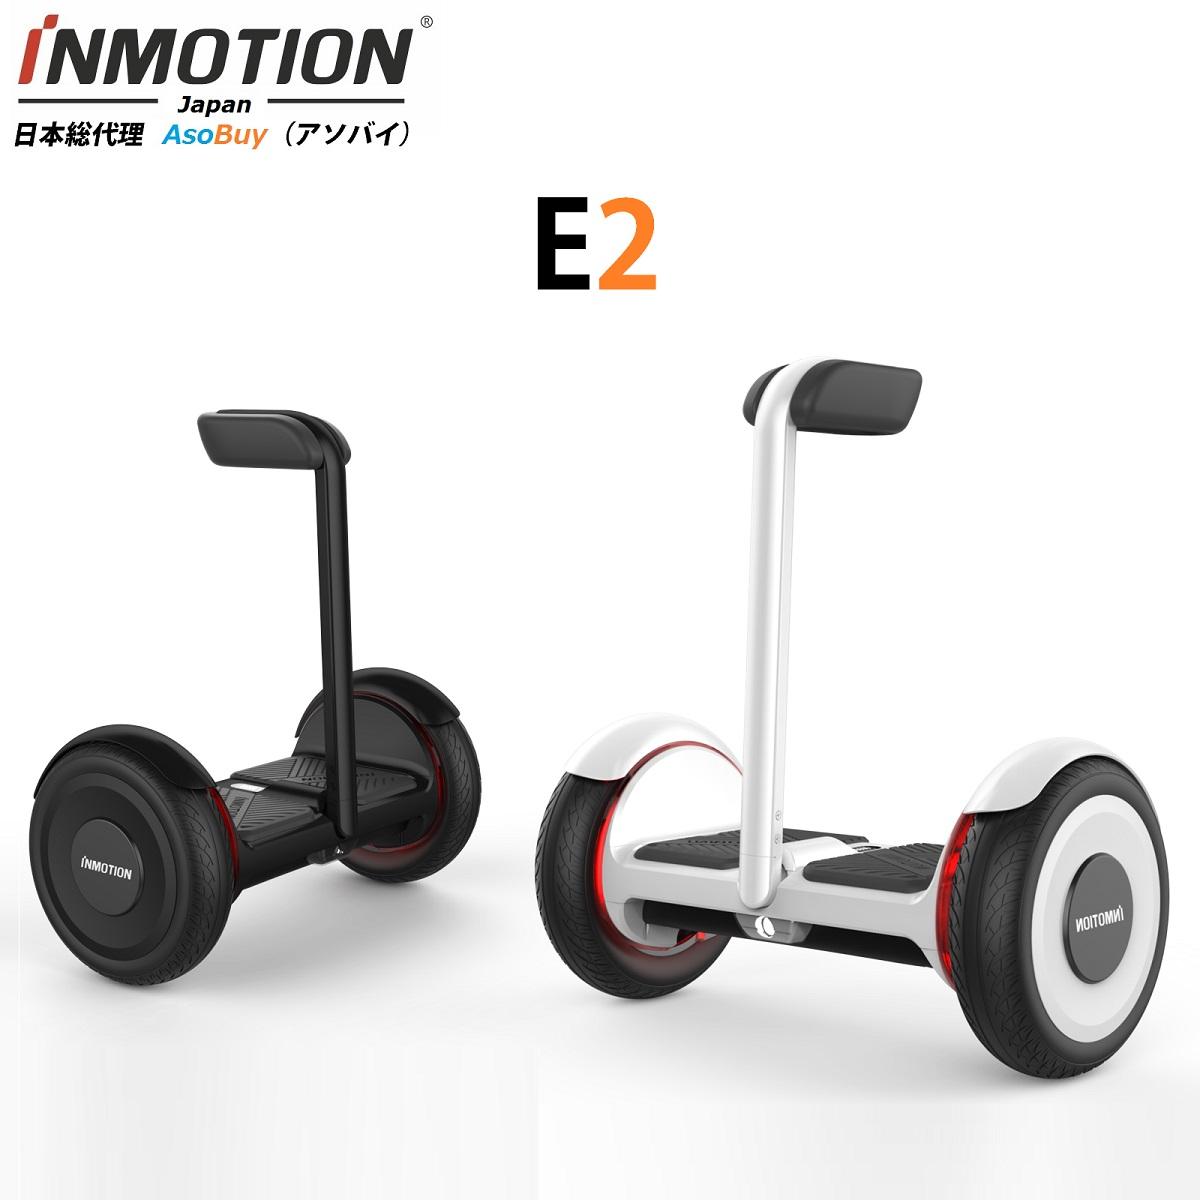 INMOTION E2 (インモーション E2) 次世帯 新型 セグウェイ Segway <S-Pro進化版>